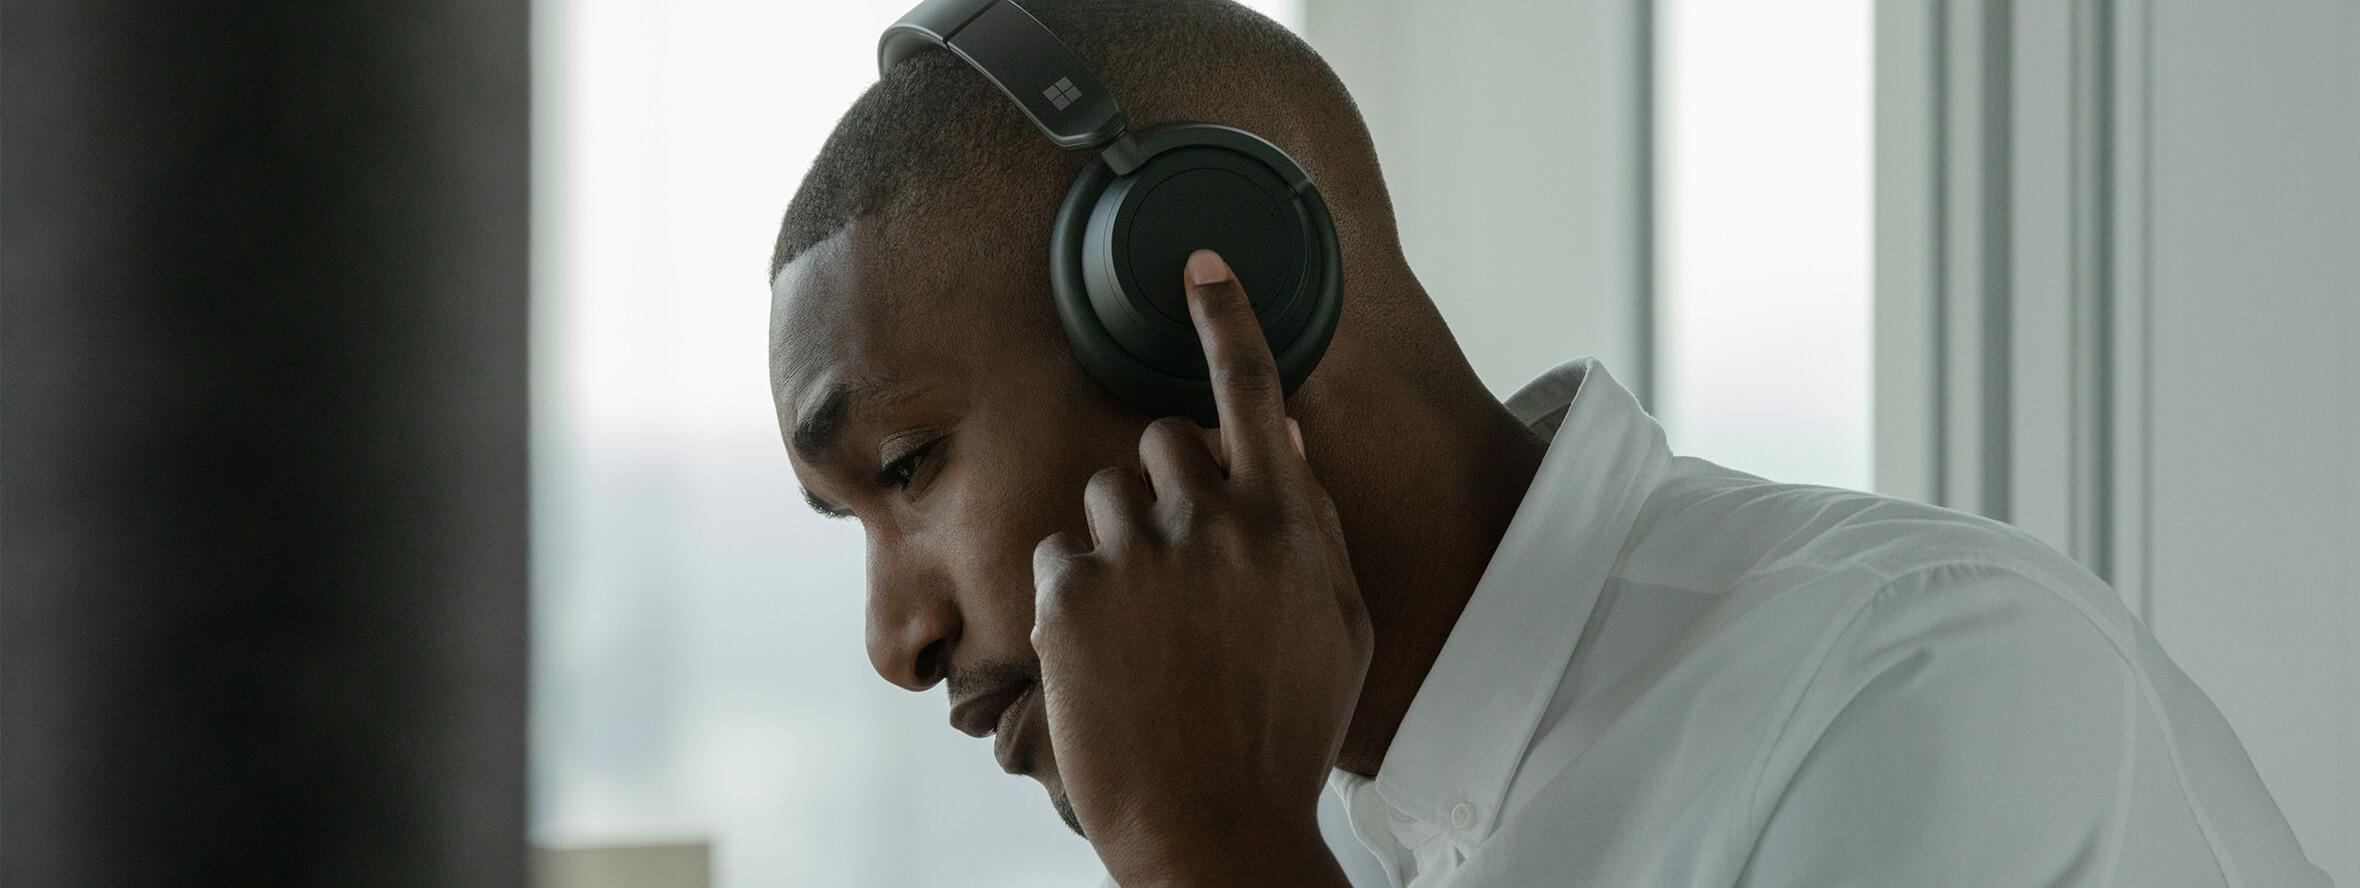 全新 Surface Headphones